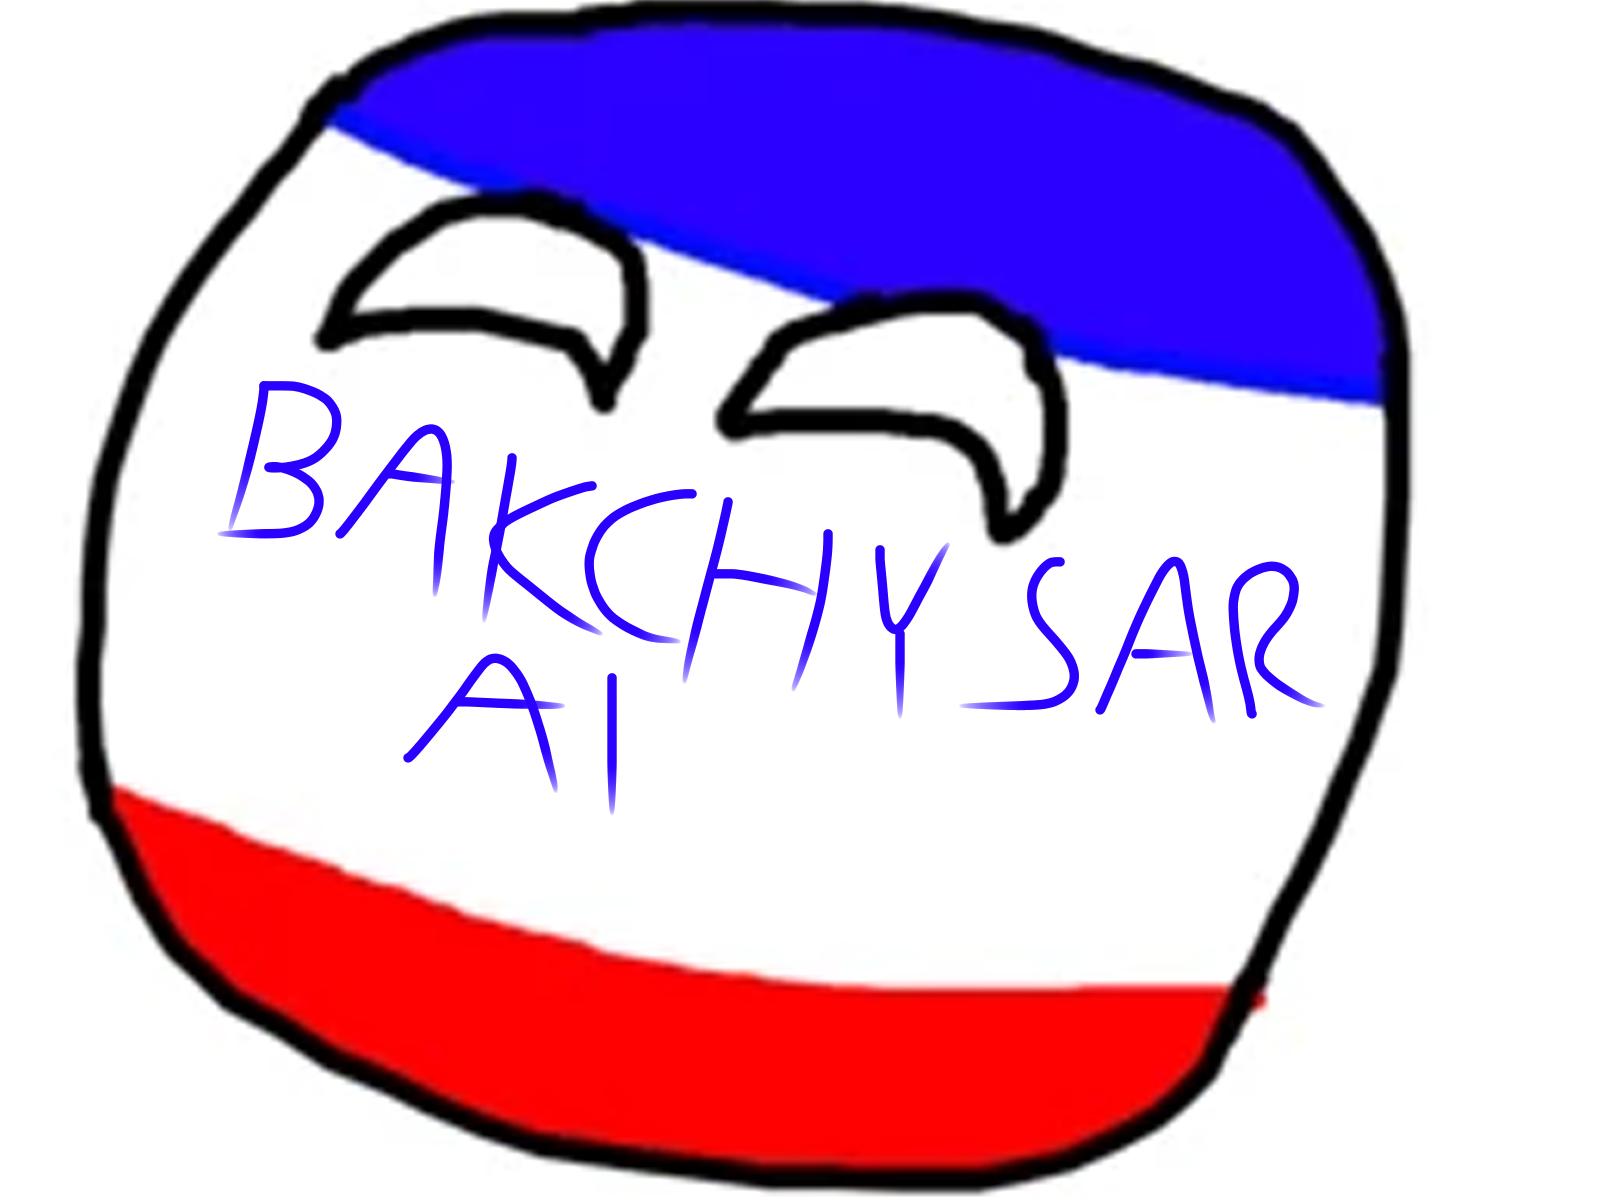 Bakhchysaraiball